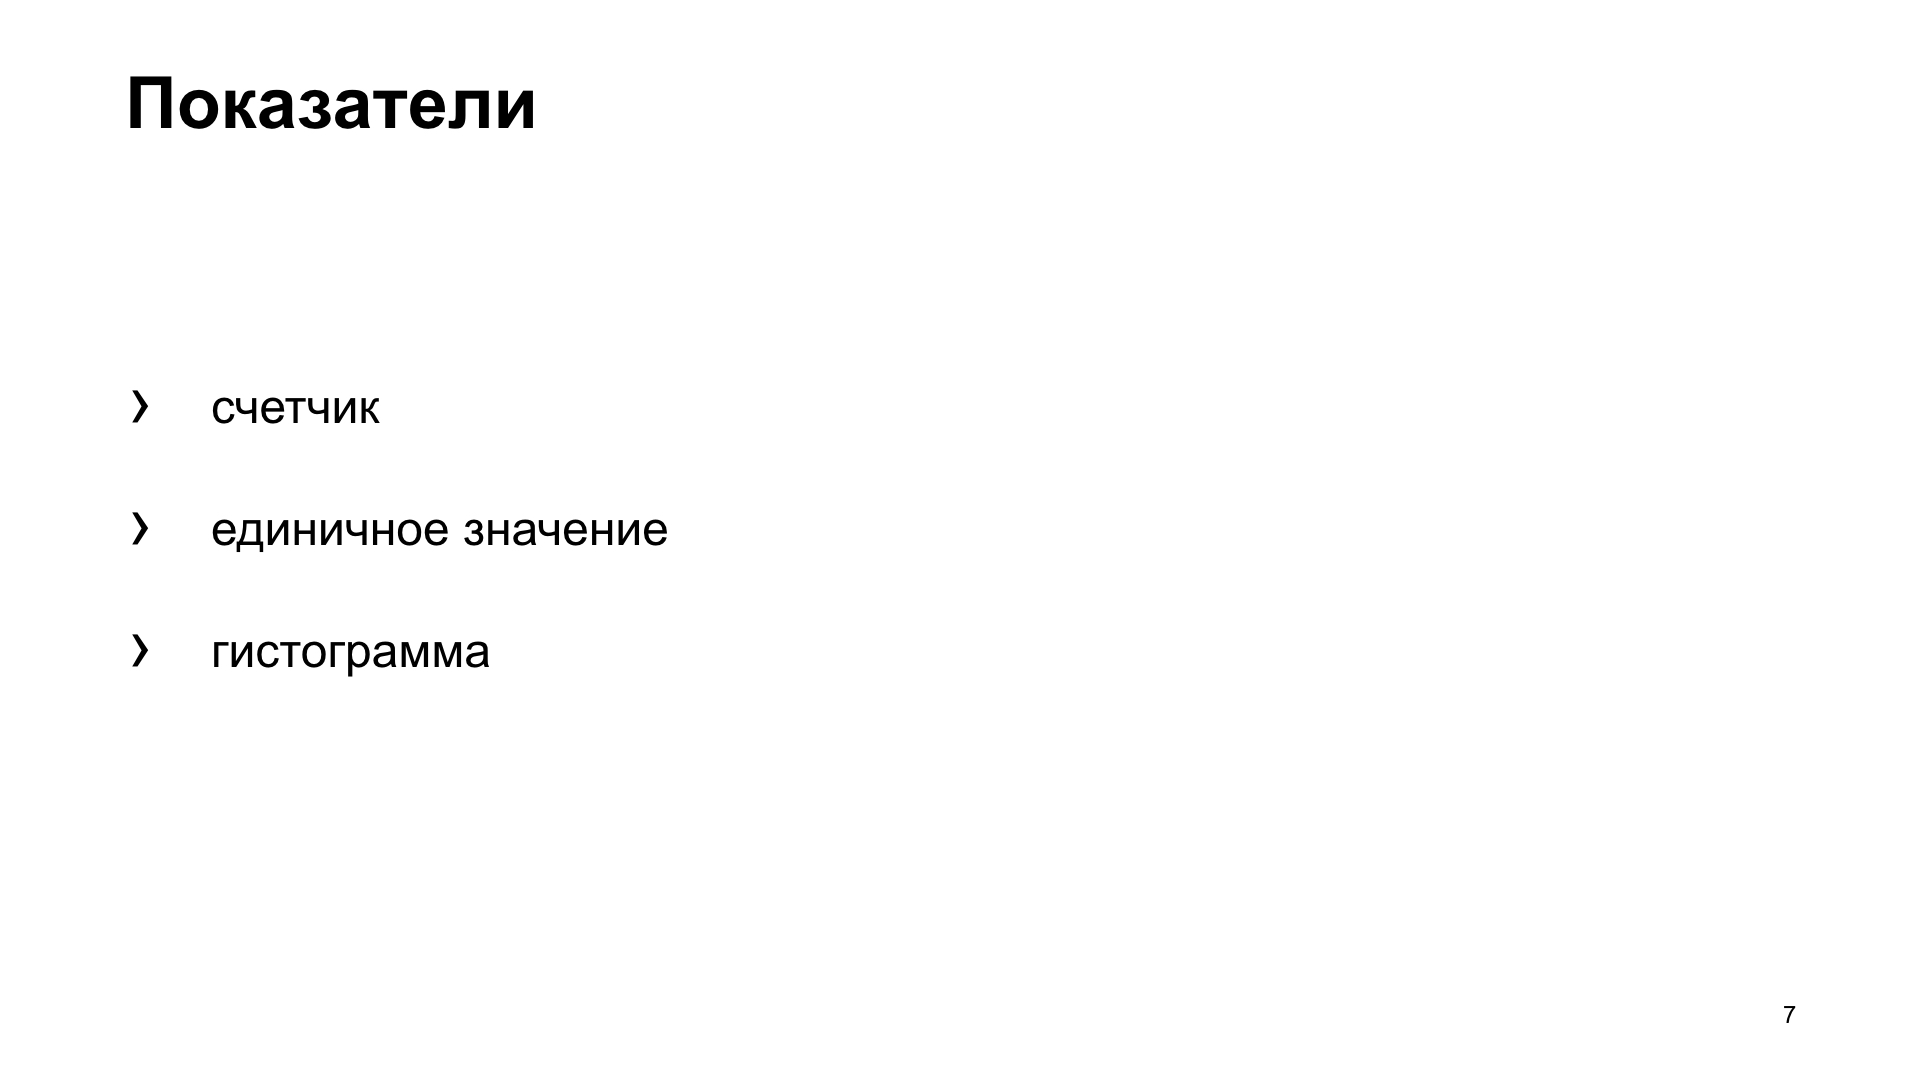 uWSGI в помощь метрикам. Доклад Яндекса - 3